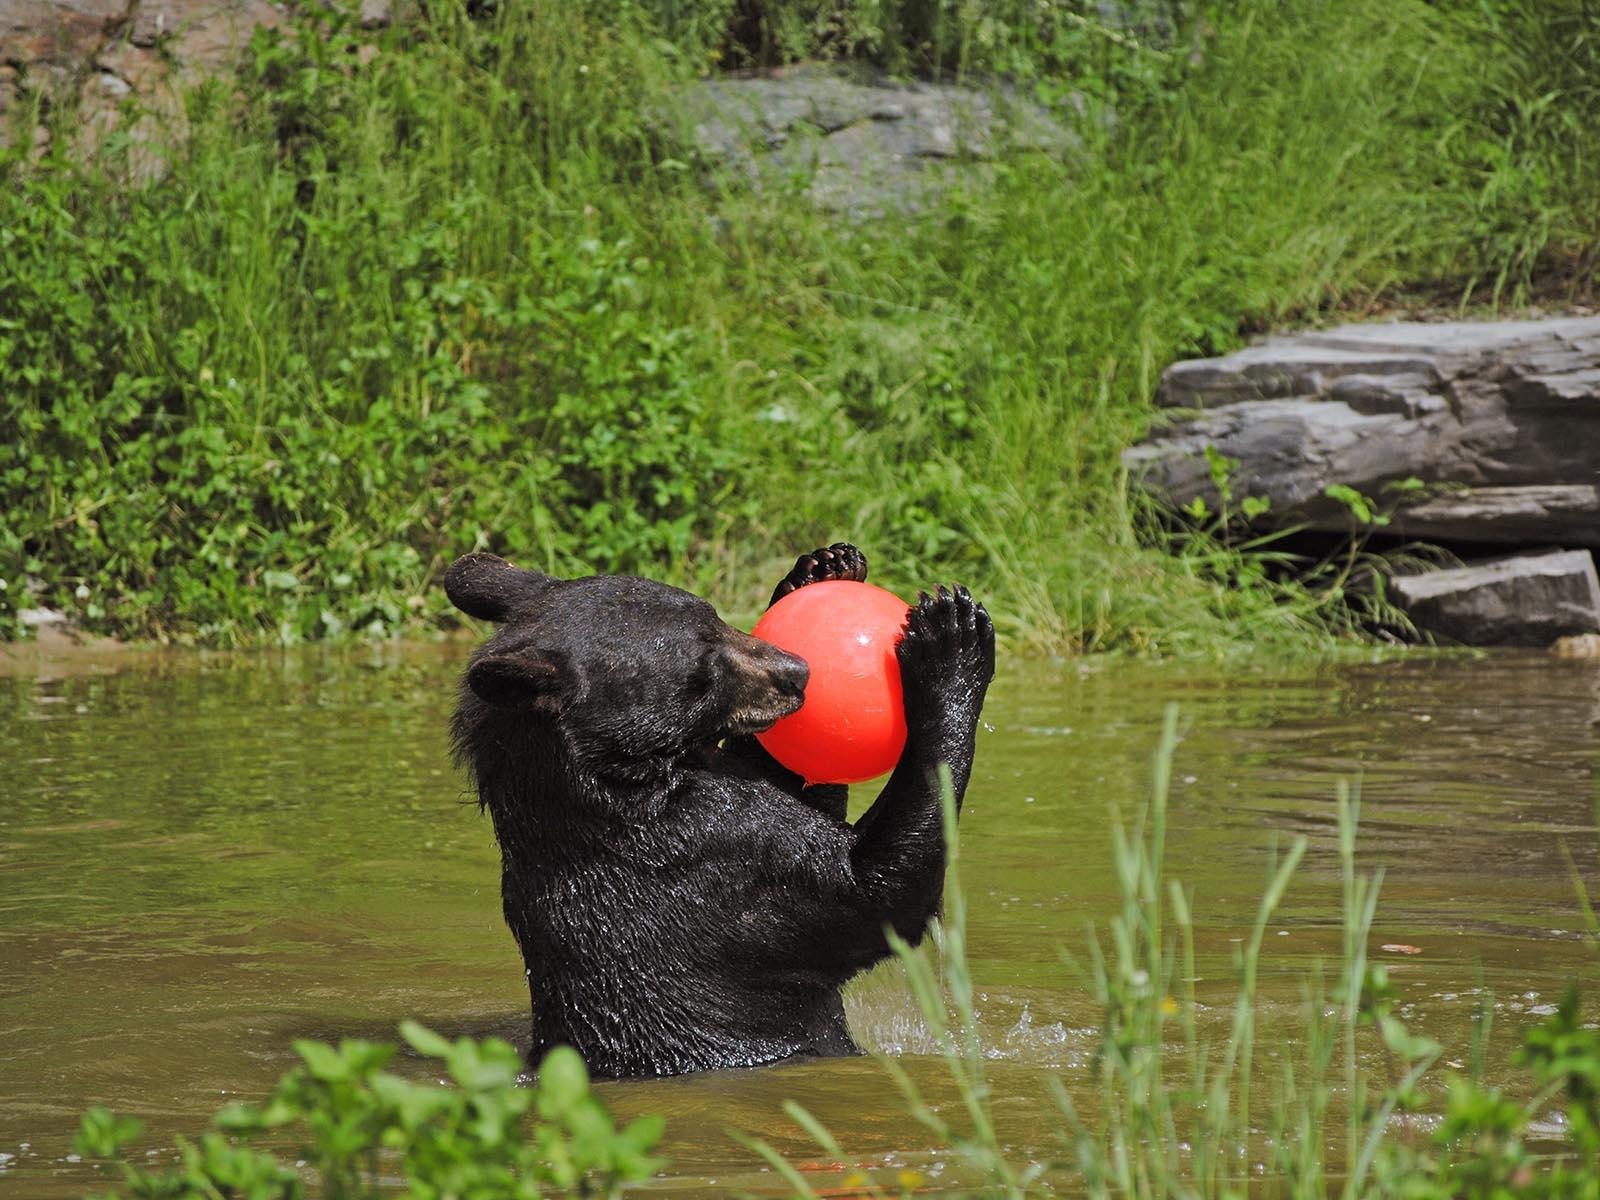 Live Cams - North American Bear CenterNorth American Bear Center